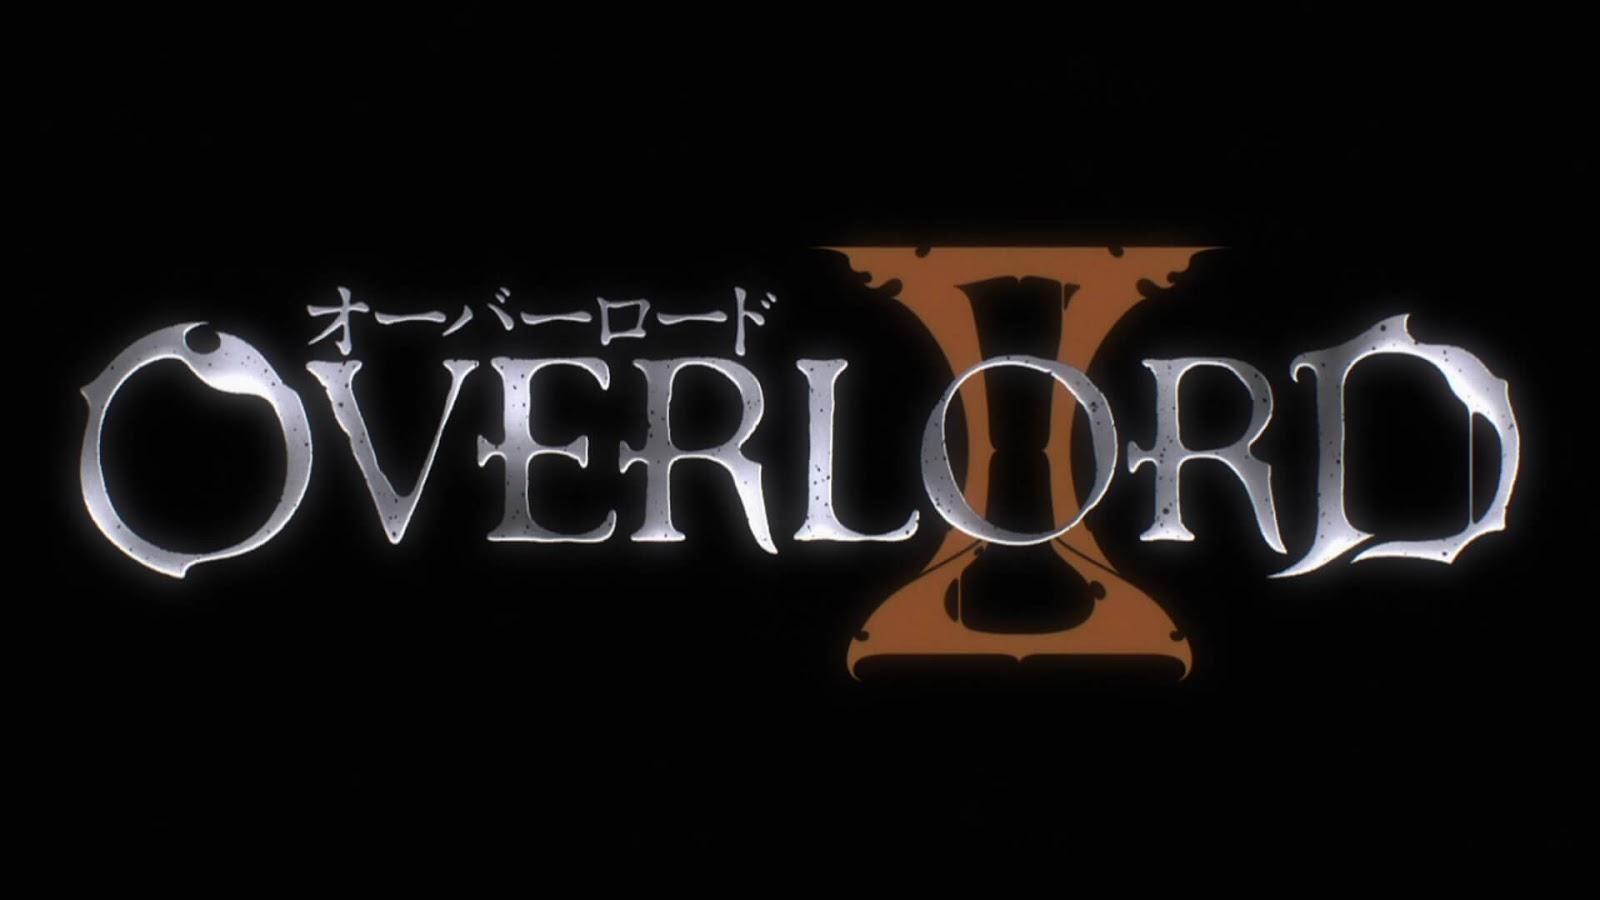 Overlord II Opening HD